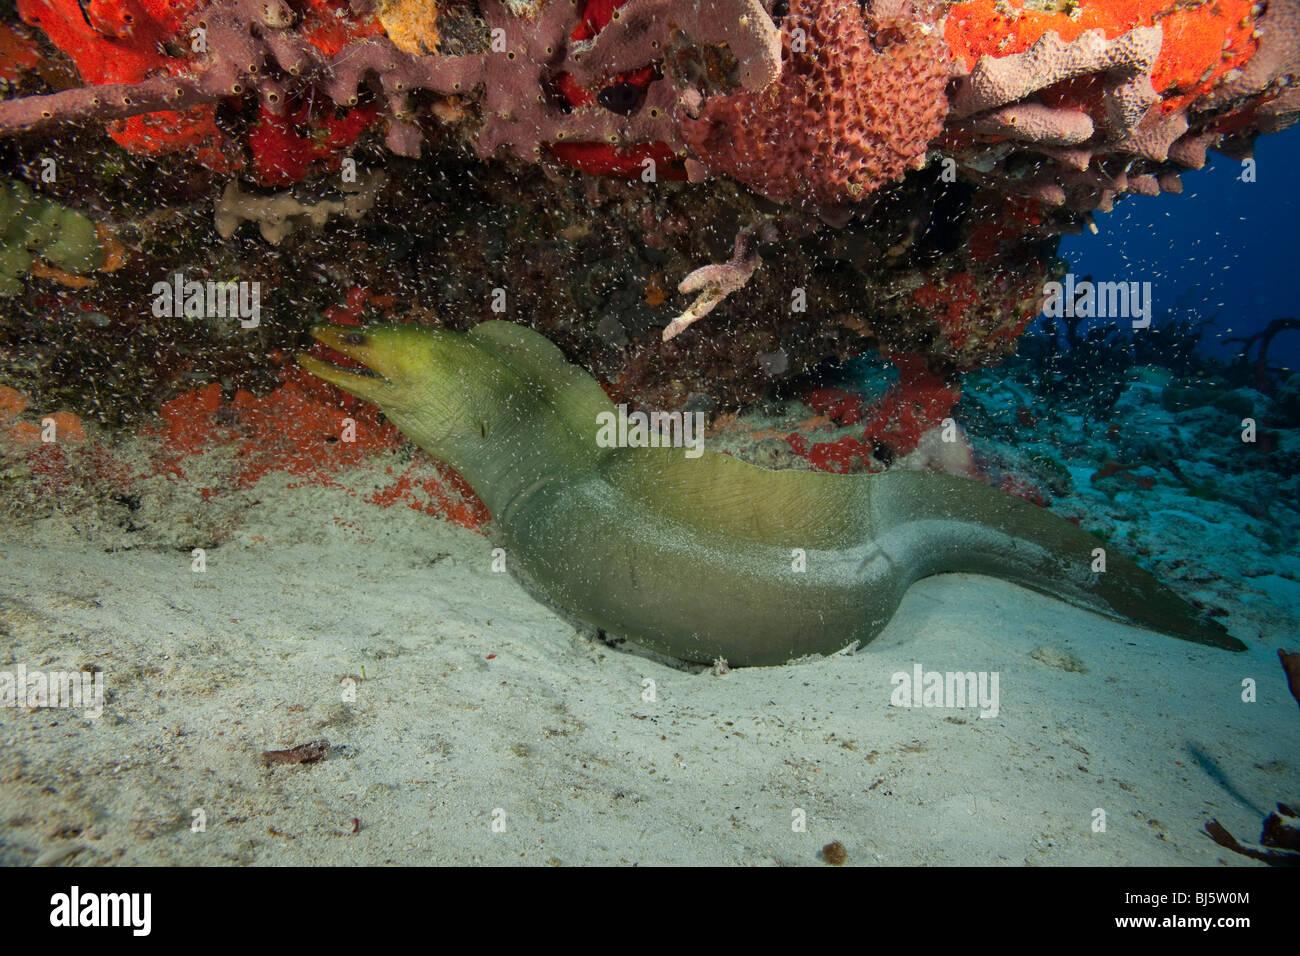 4-5' green moray eel on Villa Blanca Wall divesite, Cozumel, Mexico - Stock Image